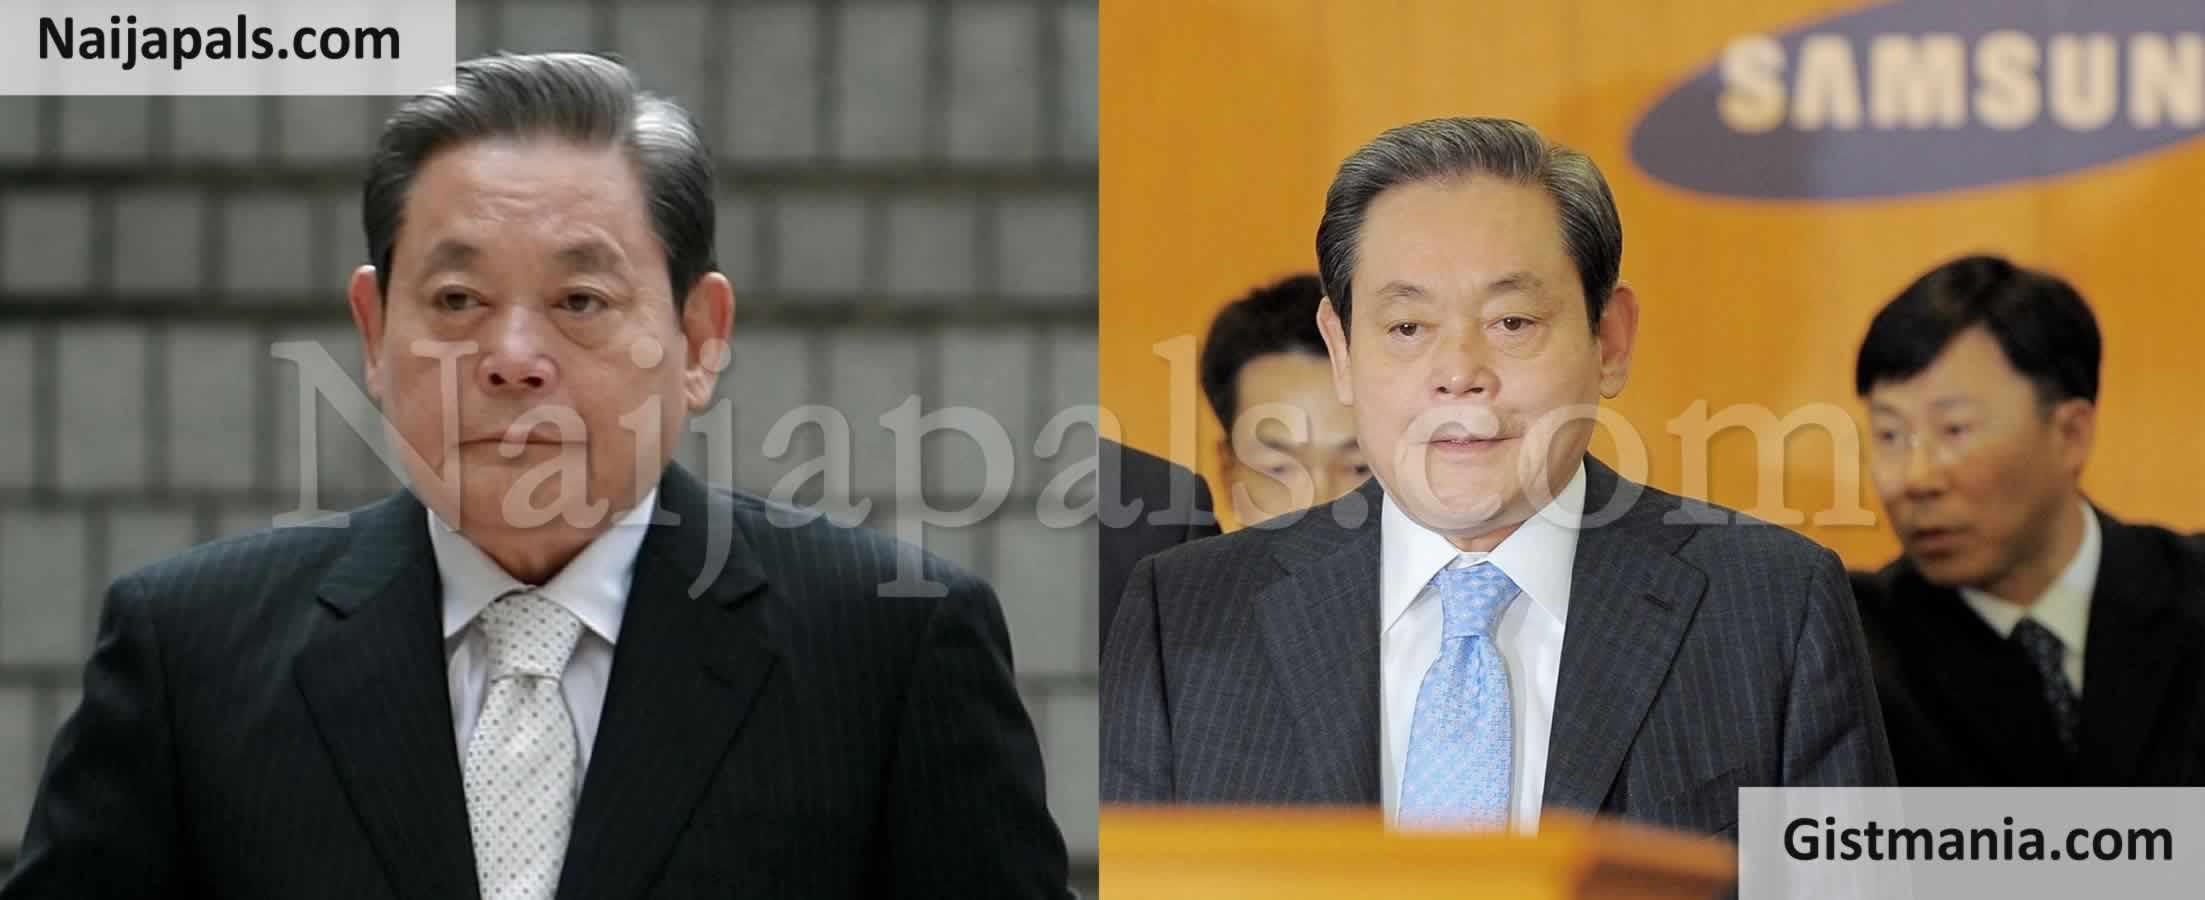 <img alt='.' class='lazyload' data-src='https://img.gistmania.com/emot/news.gif' /> <b>Giant Electronics Company, Samsung's Chairman, Lee Kun-Hee Dies At 85</b>